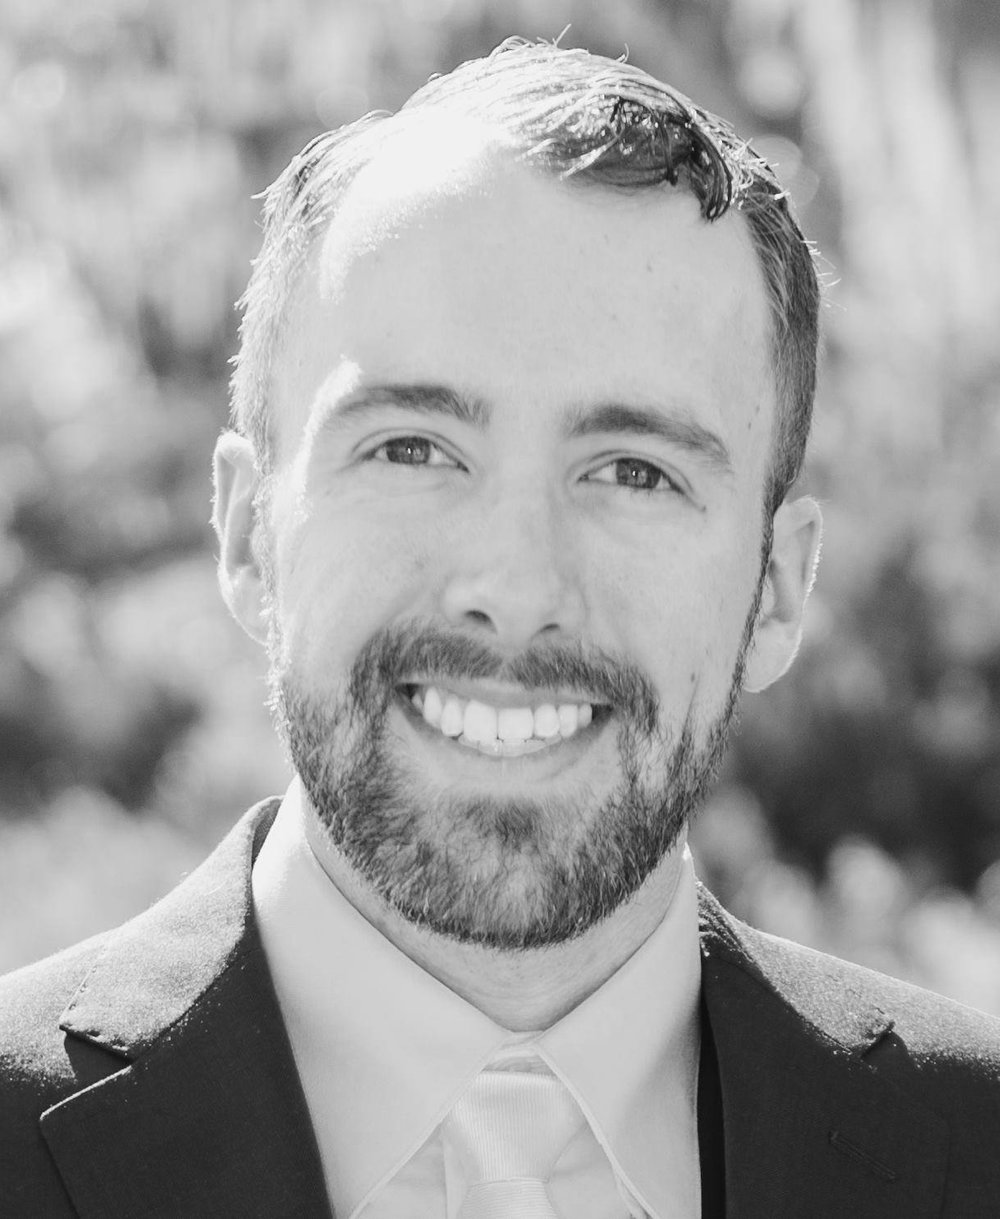 Ryan Winter Keller Williams real estate top agent